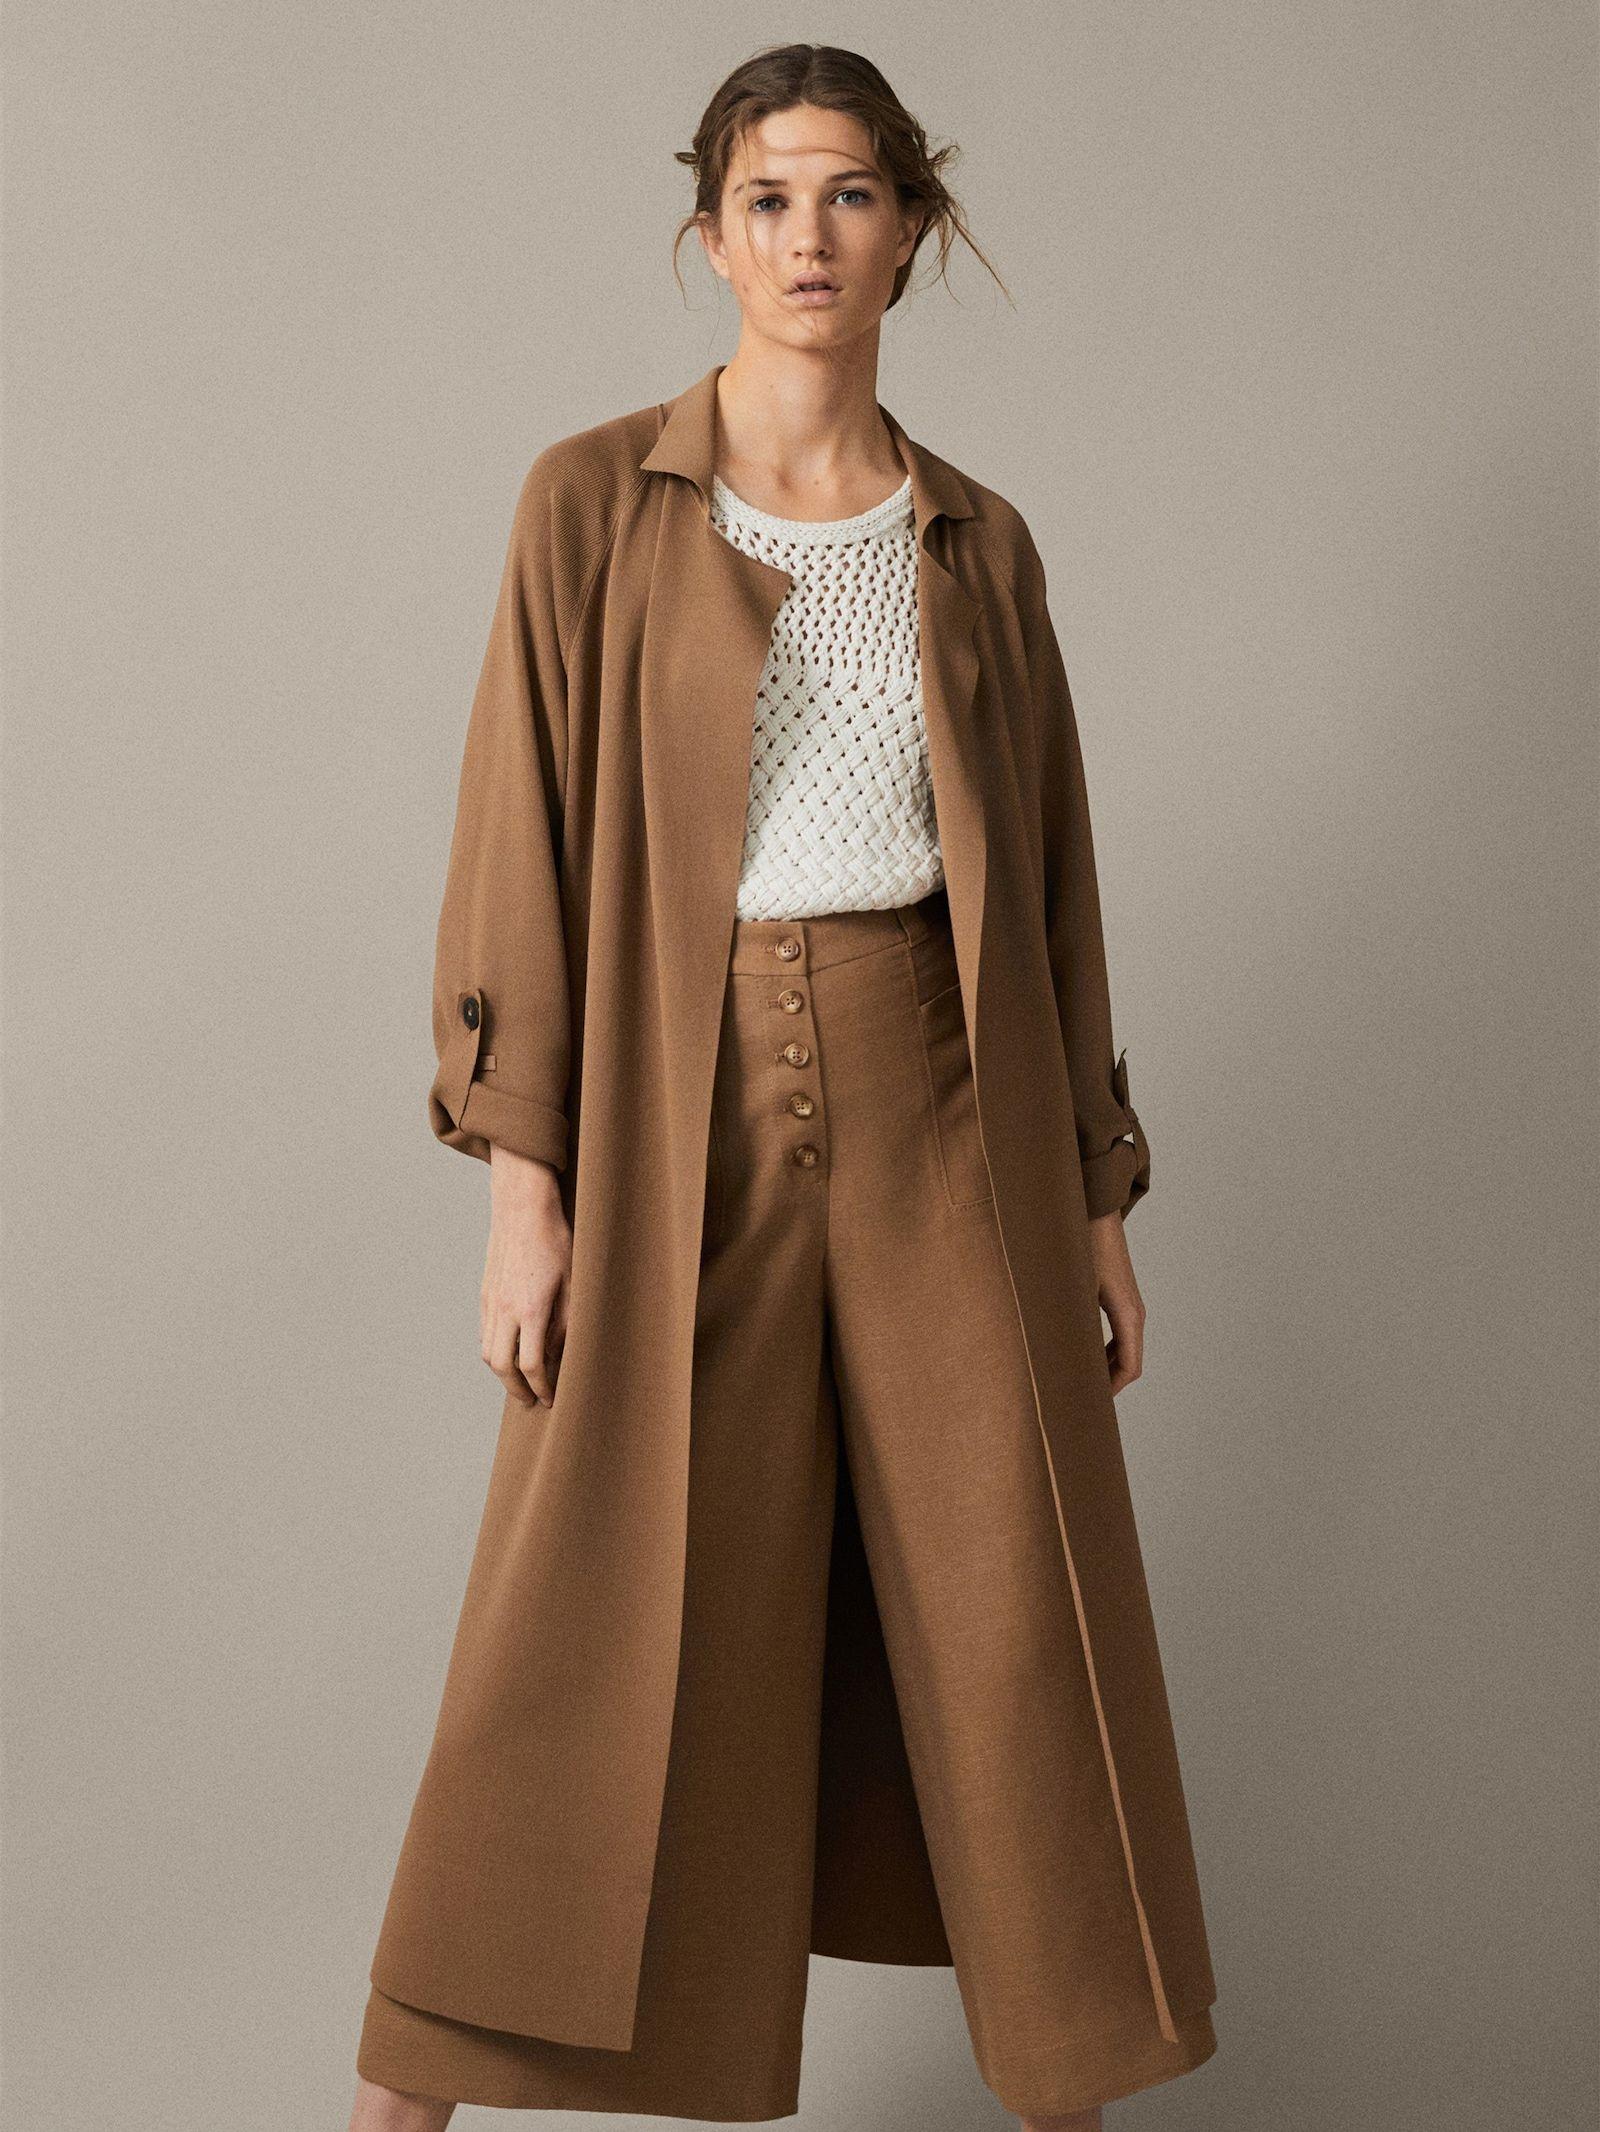 Women S Sweaters Cardigans Massimo Dutti Spring Summer 2019 Cardigan Fashion Outerwear Women Massimo Dutti